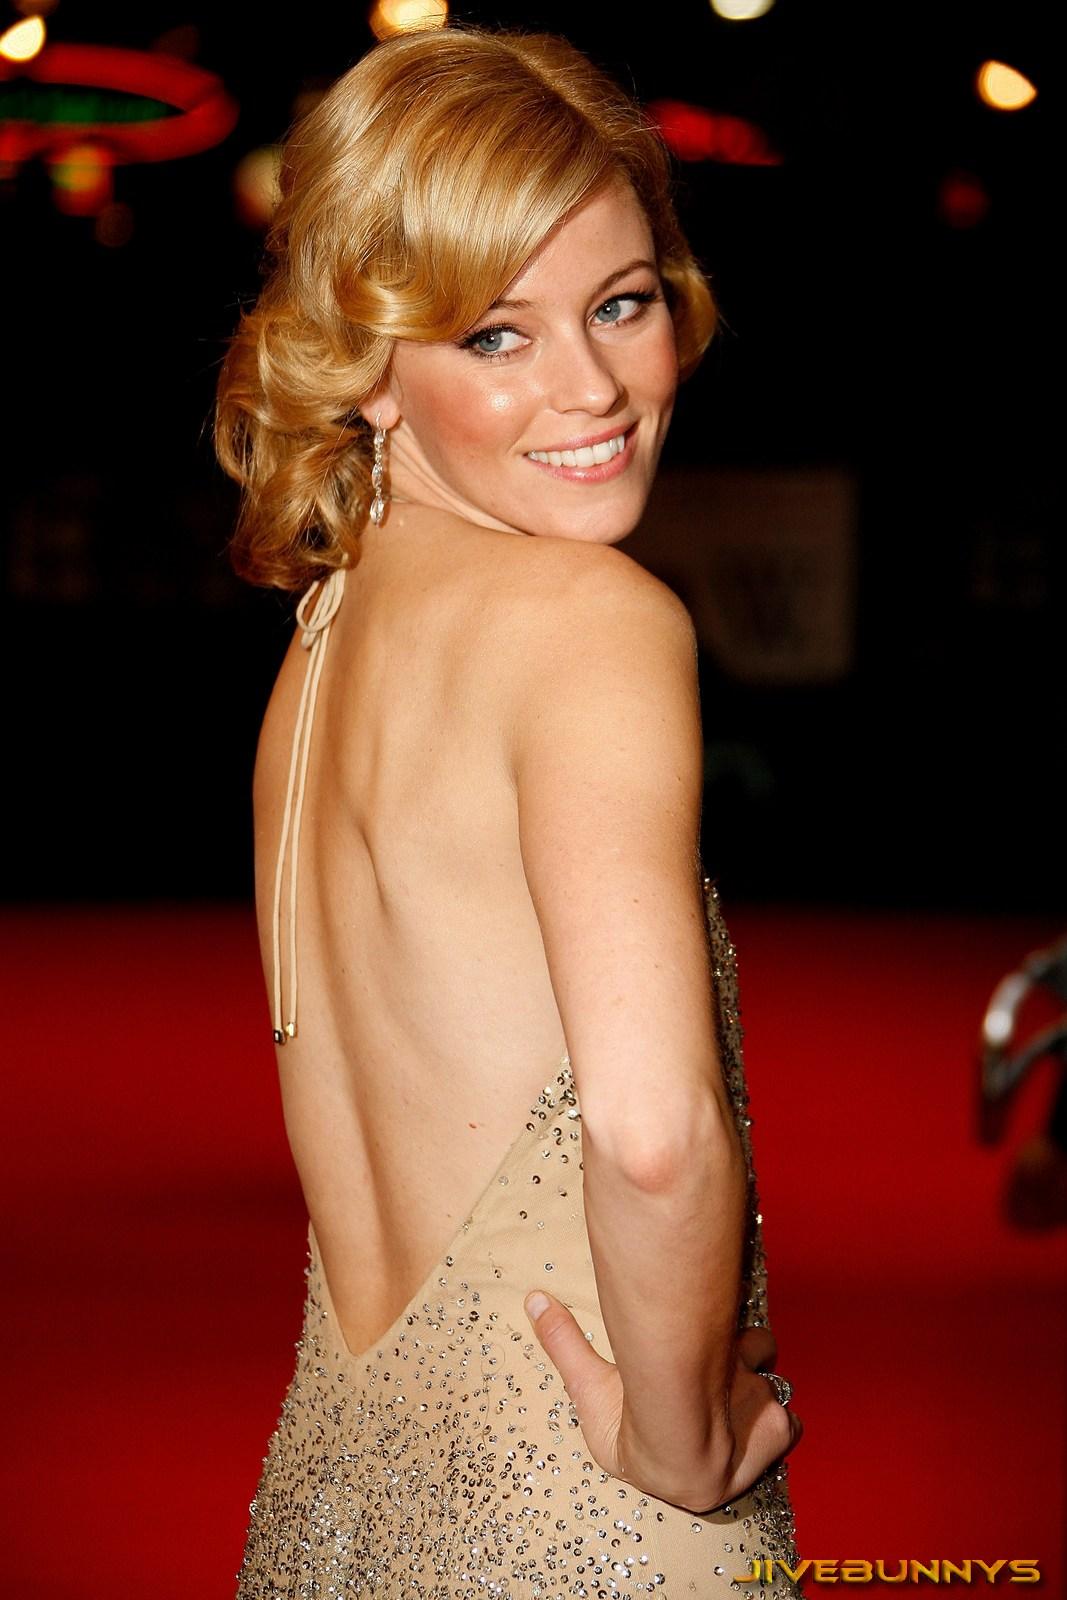 http://2.bp.blogspot.com/-W2RfmuSe7_U/T3XMuXvo_vI/AAAAAAAADu8/n-grciJc80k/s1600/elizabeth-banks-actress-celebrity-101249.jpg